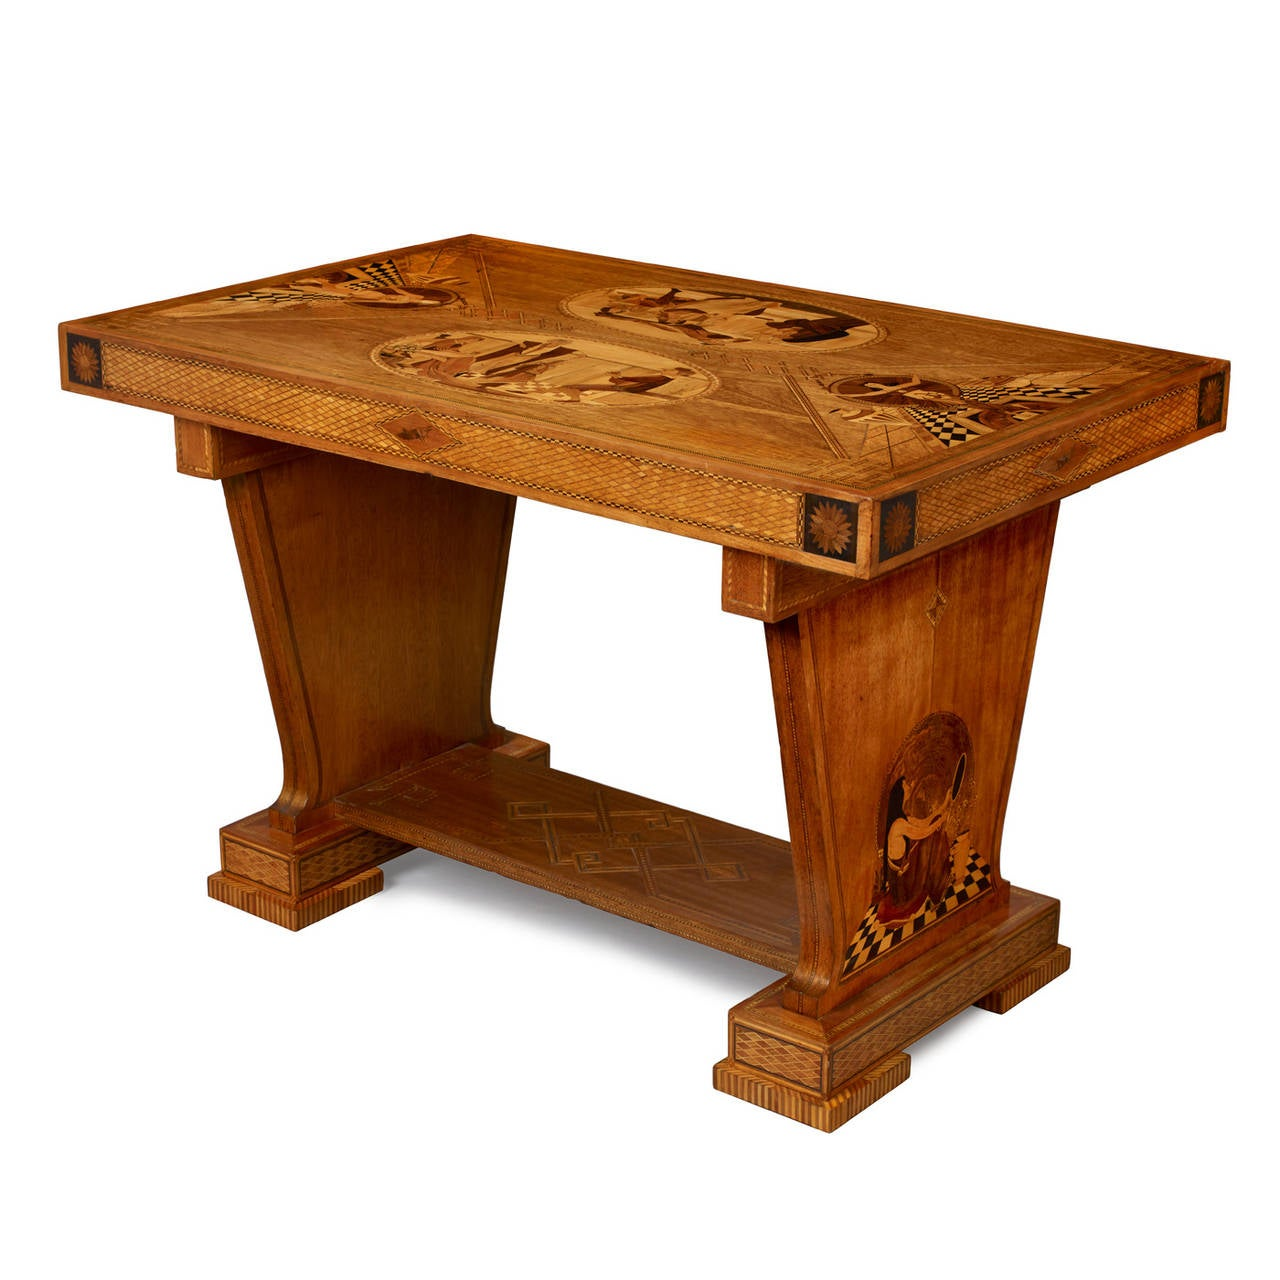 art deco outdoor furniture. art deco marquetry center table 2 outdoor furniture u